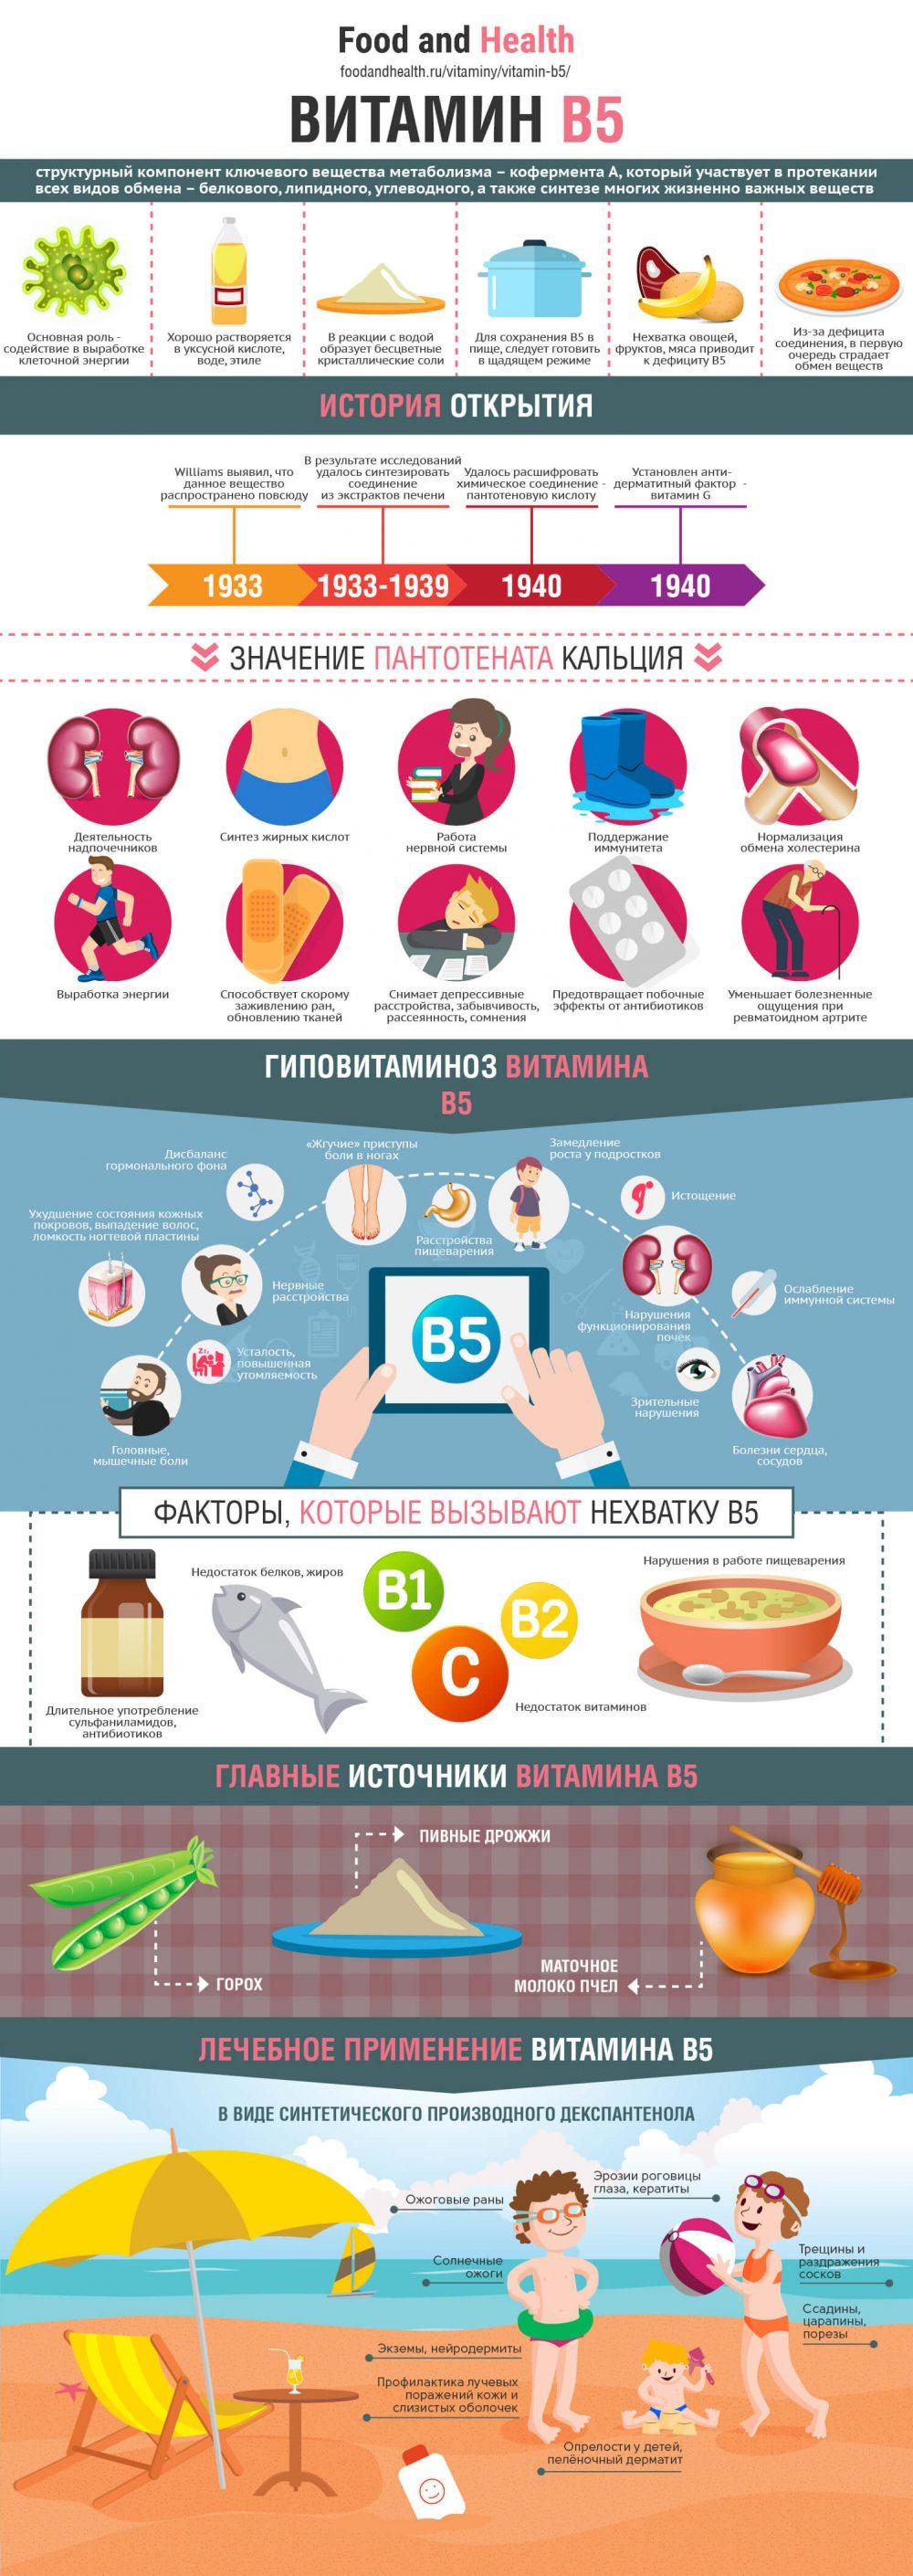 Витамин B5 - инфографика